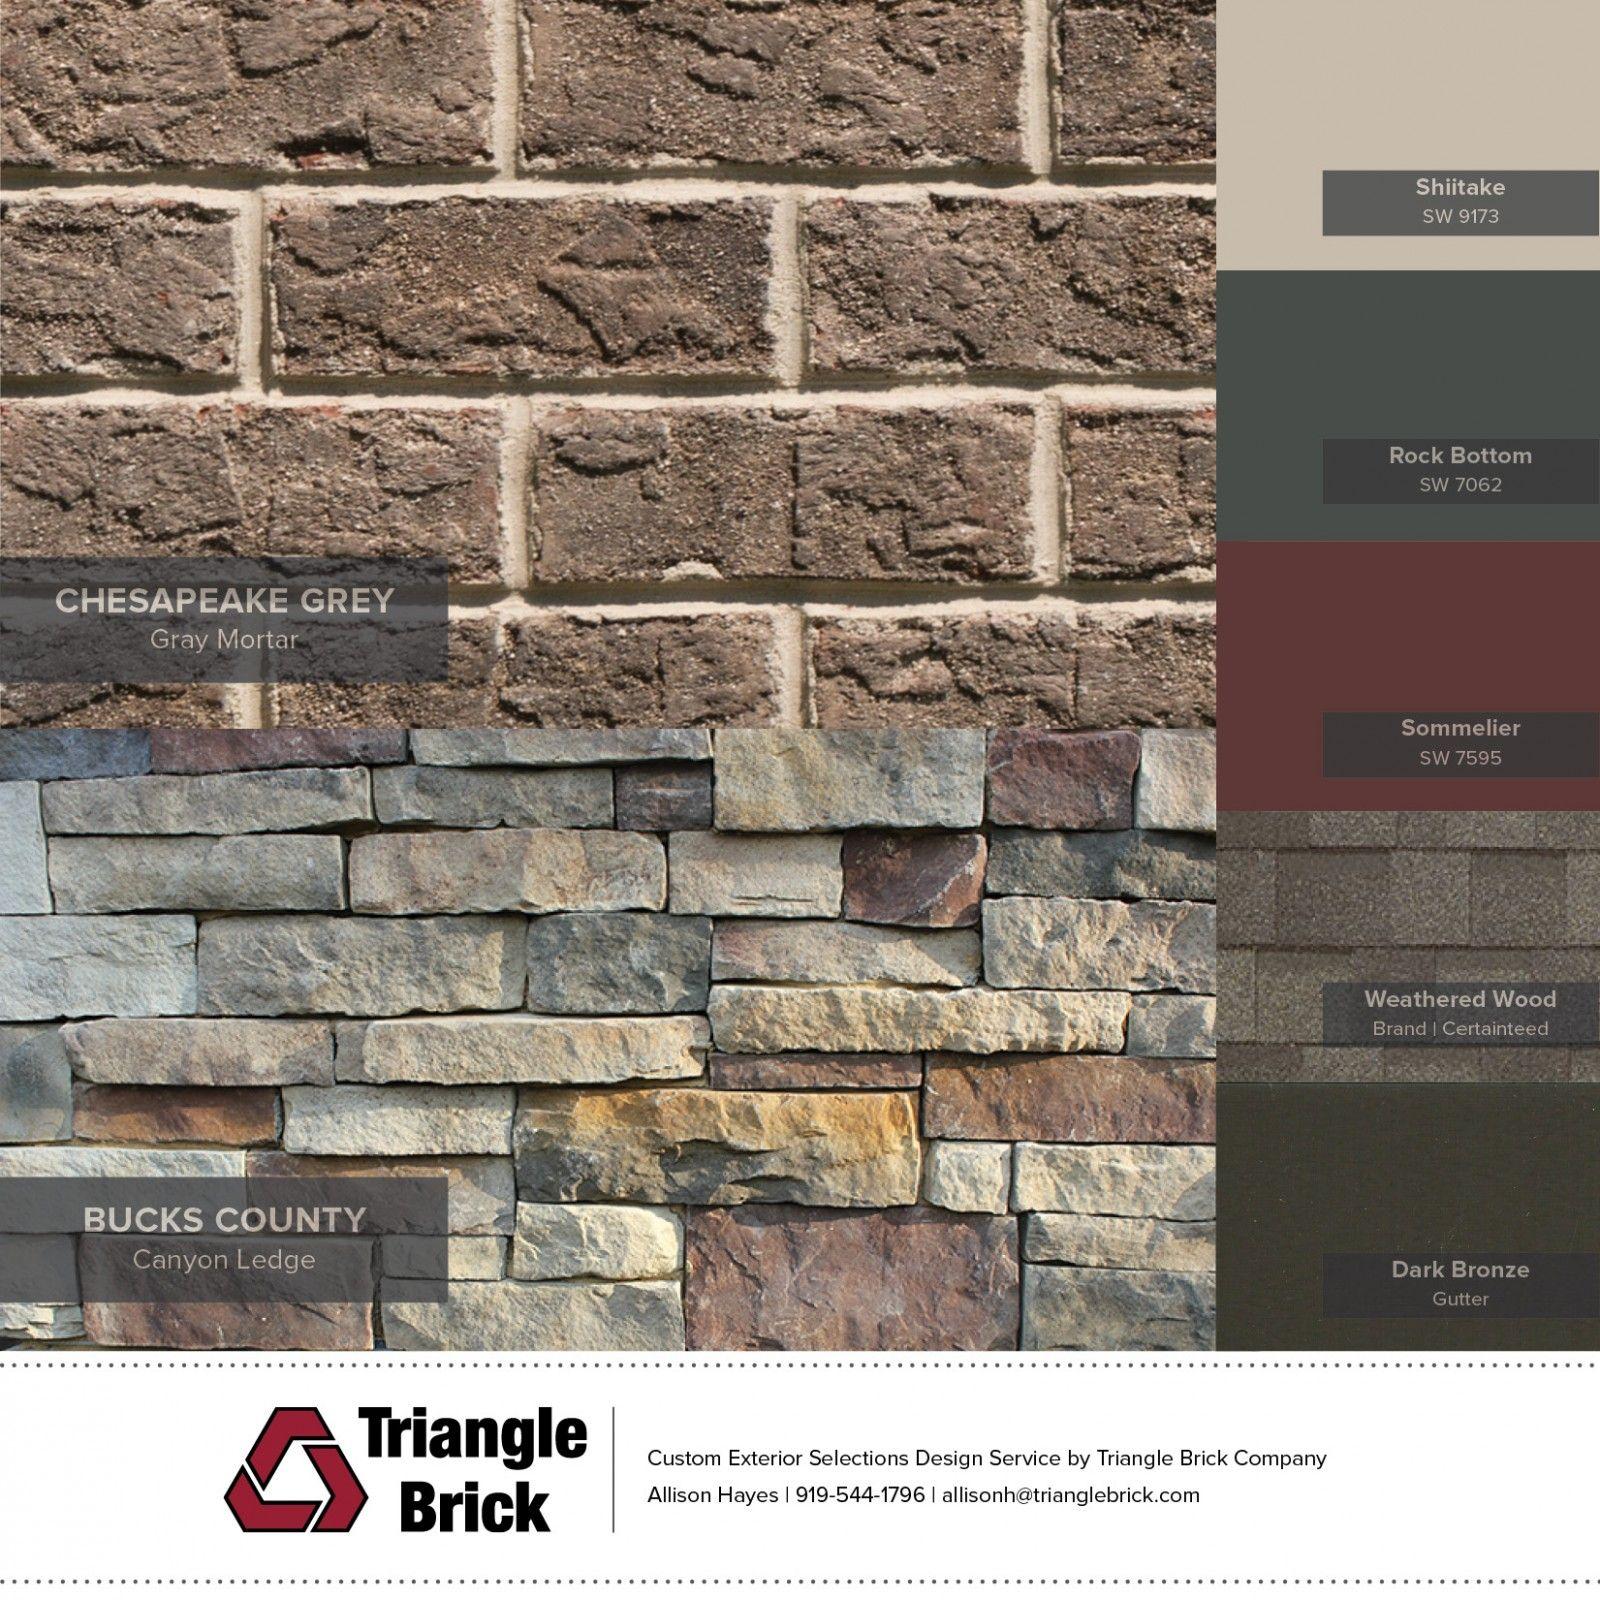 Brick And Stone Pairings Brick House Exterior Colors House Exterior Color Schemes Brick Exterior House